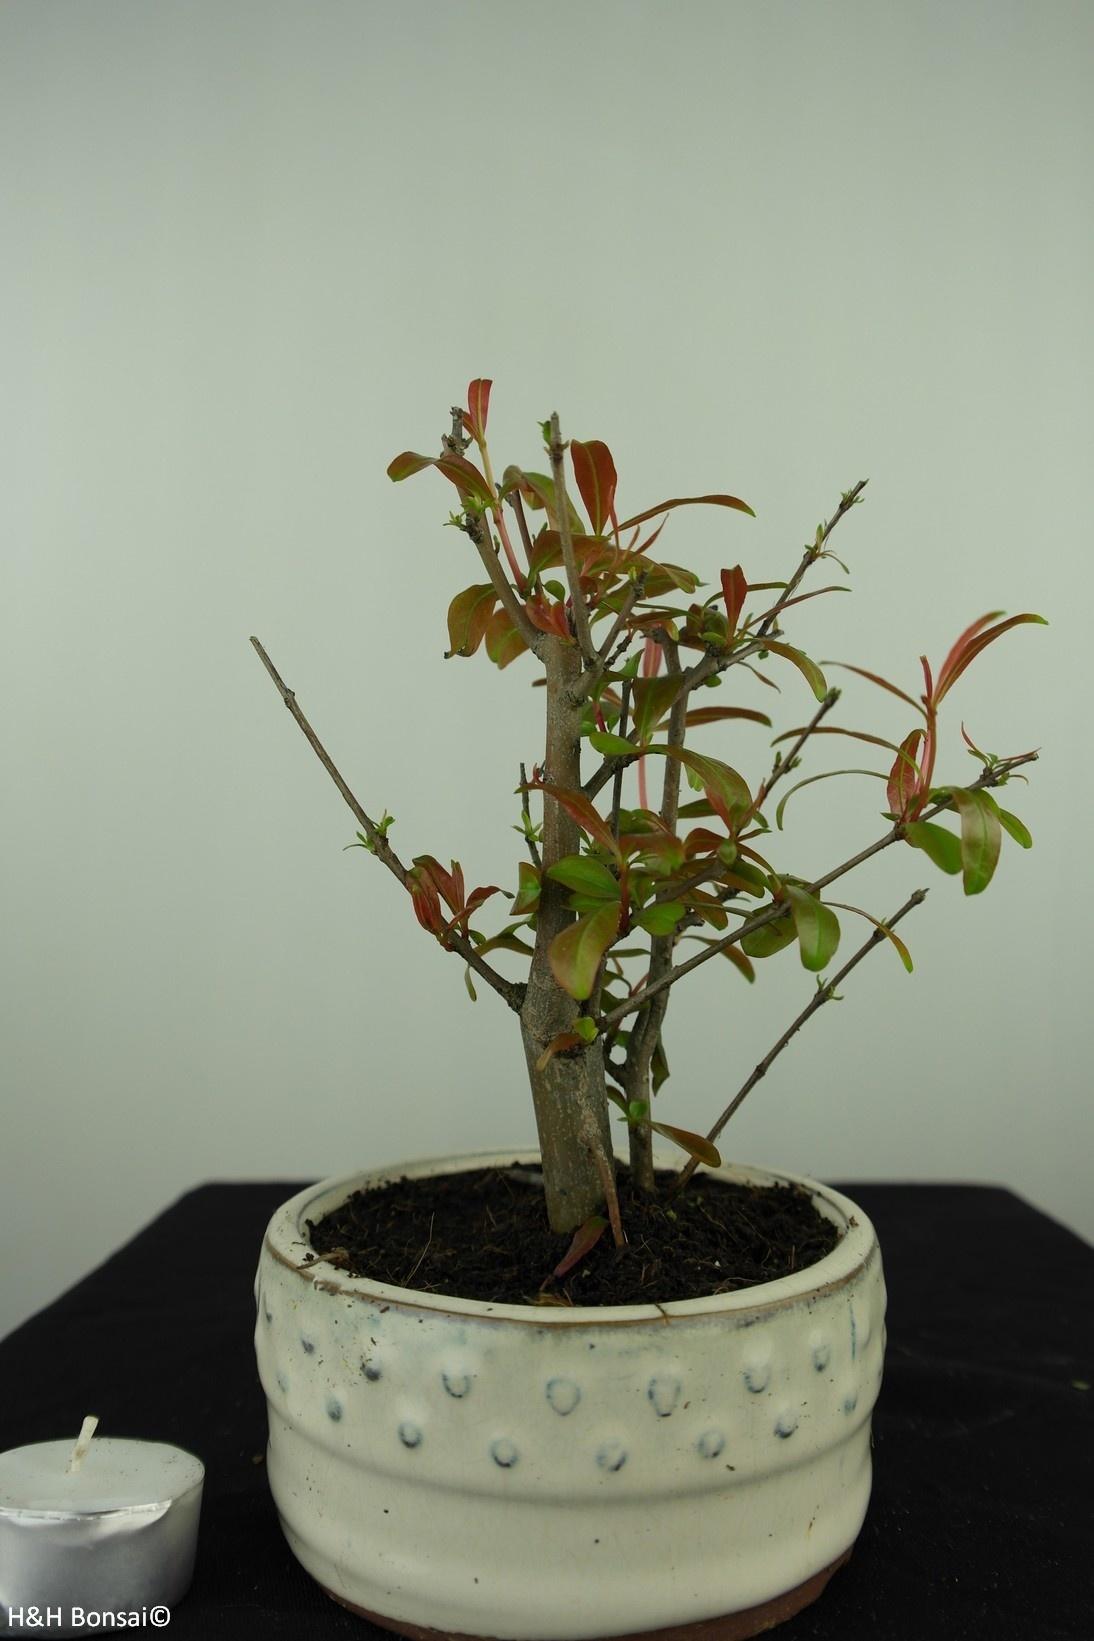 Bonsai Granatapfel, Punica granatum, nr. 7594